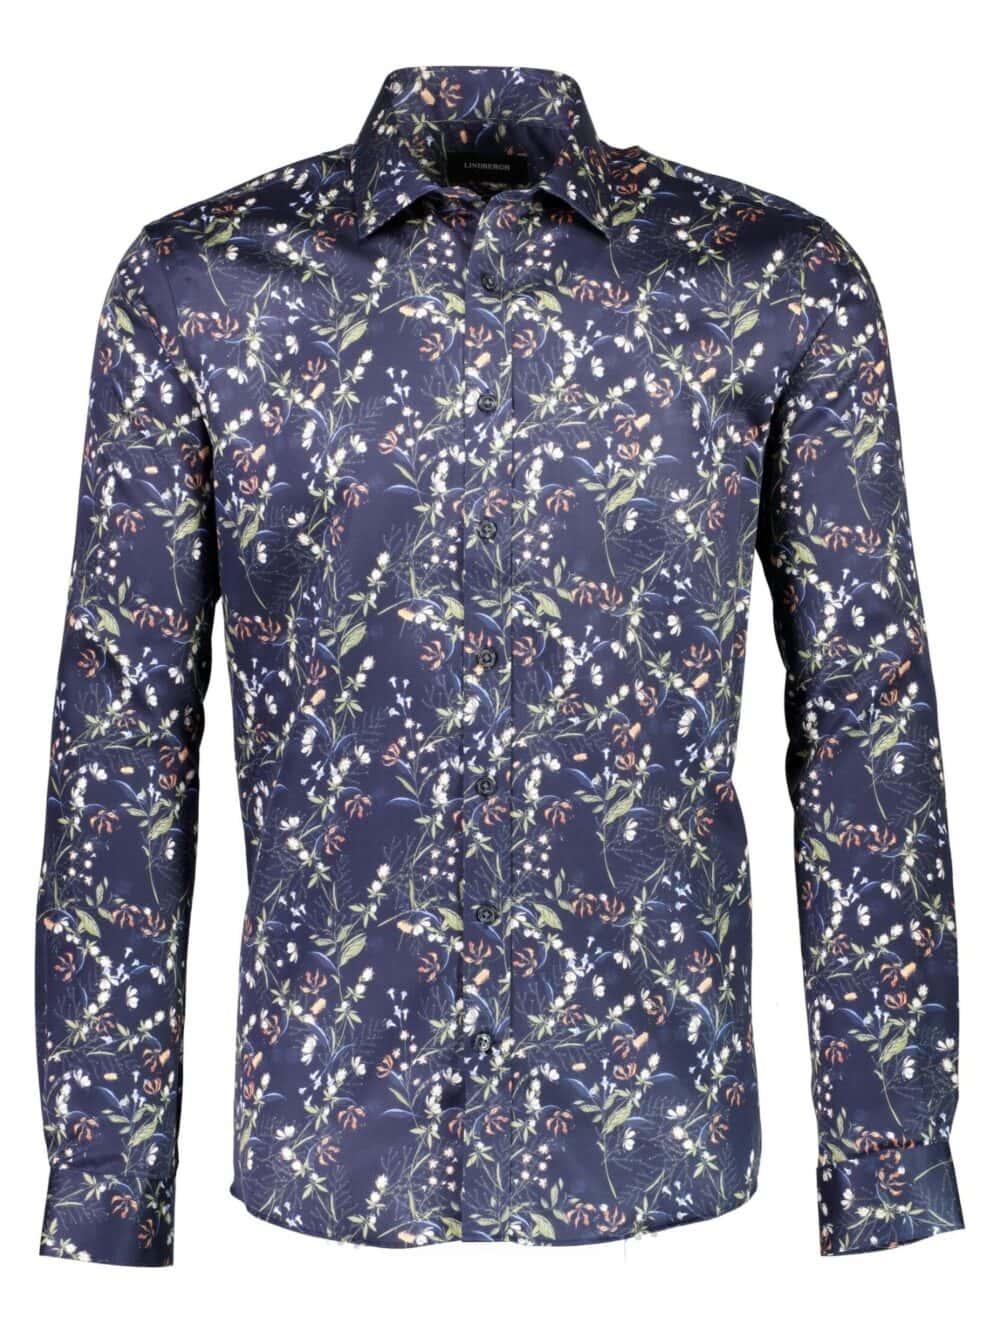 Lindbergh Black Technical Skjorte Dark Blue